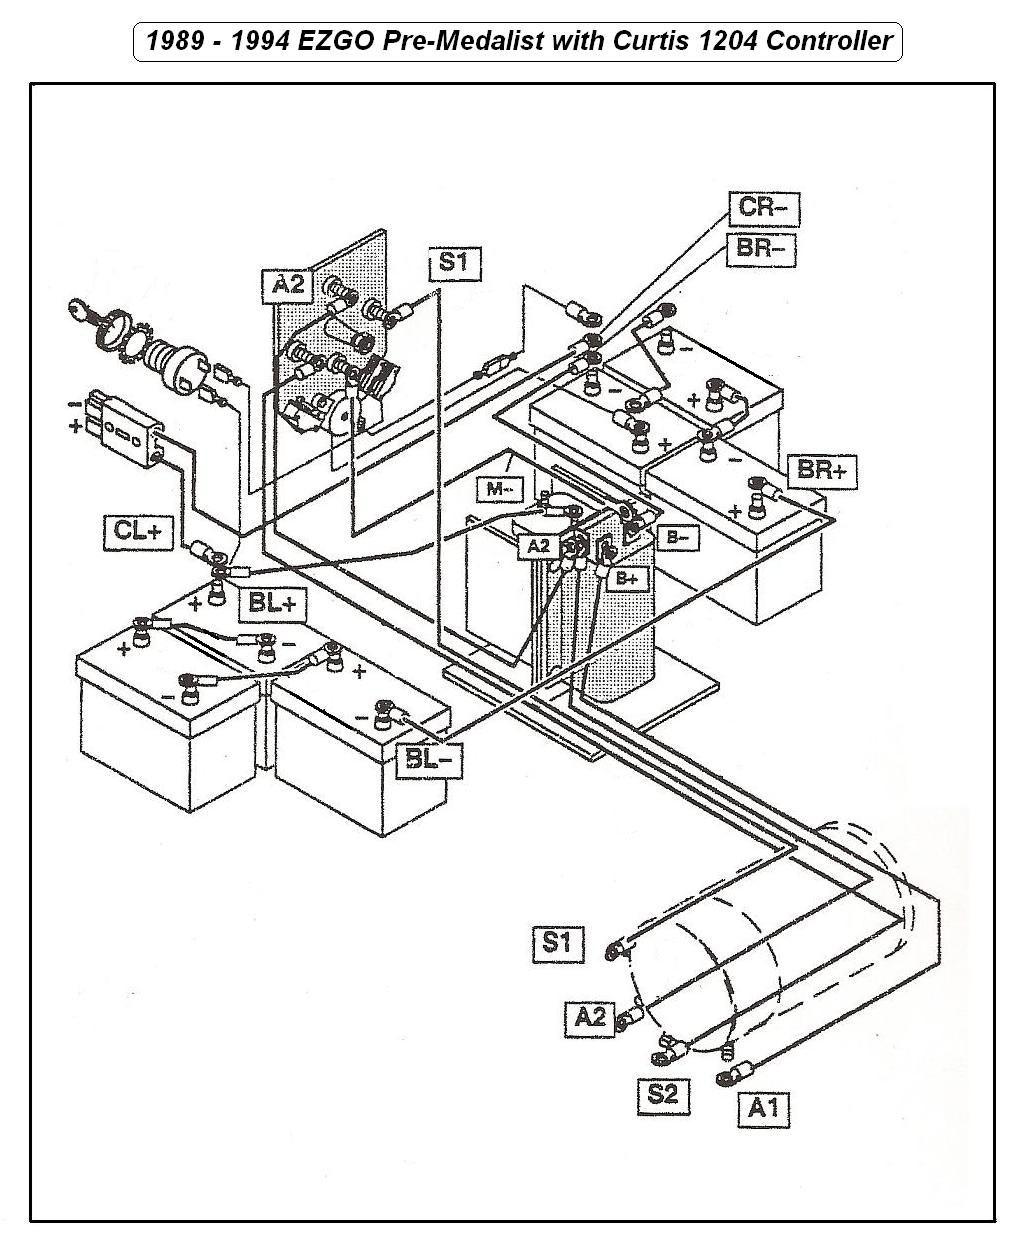 36 Volt Solenoid Wiring Diagram Amf Database For Club Car | Shtab - 36 Volt Golf Cart Wiring Diagram